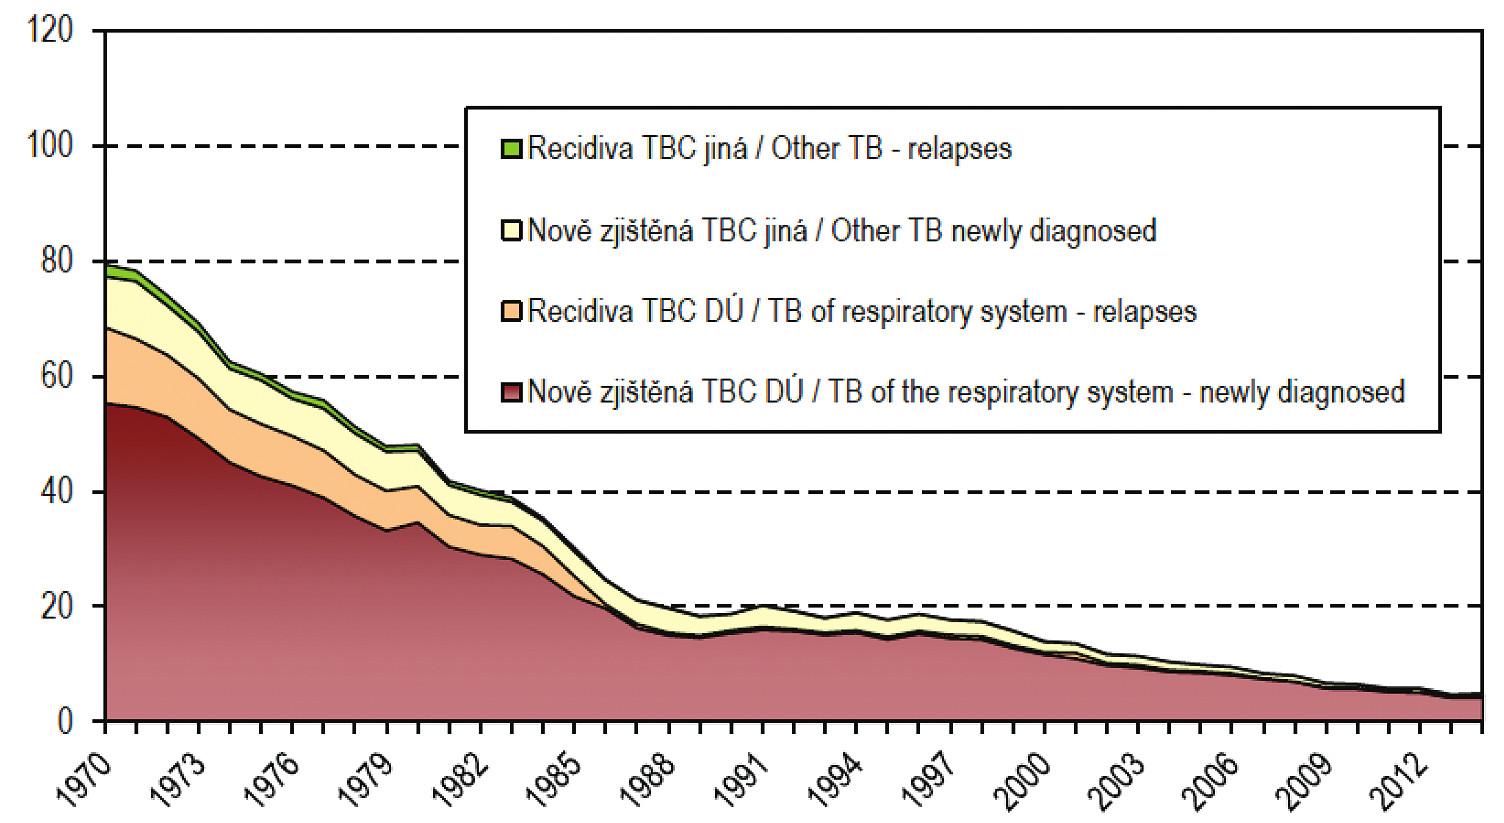 Vývoj počtu hlášených onemocnění tuberkulózou na 100 000 obyvatel v ČR